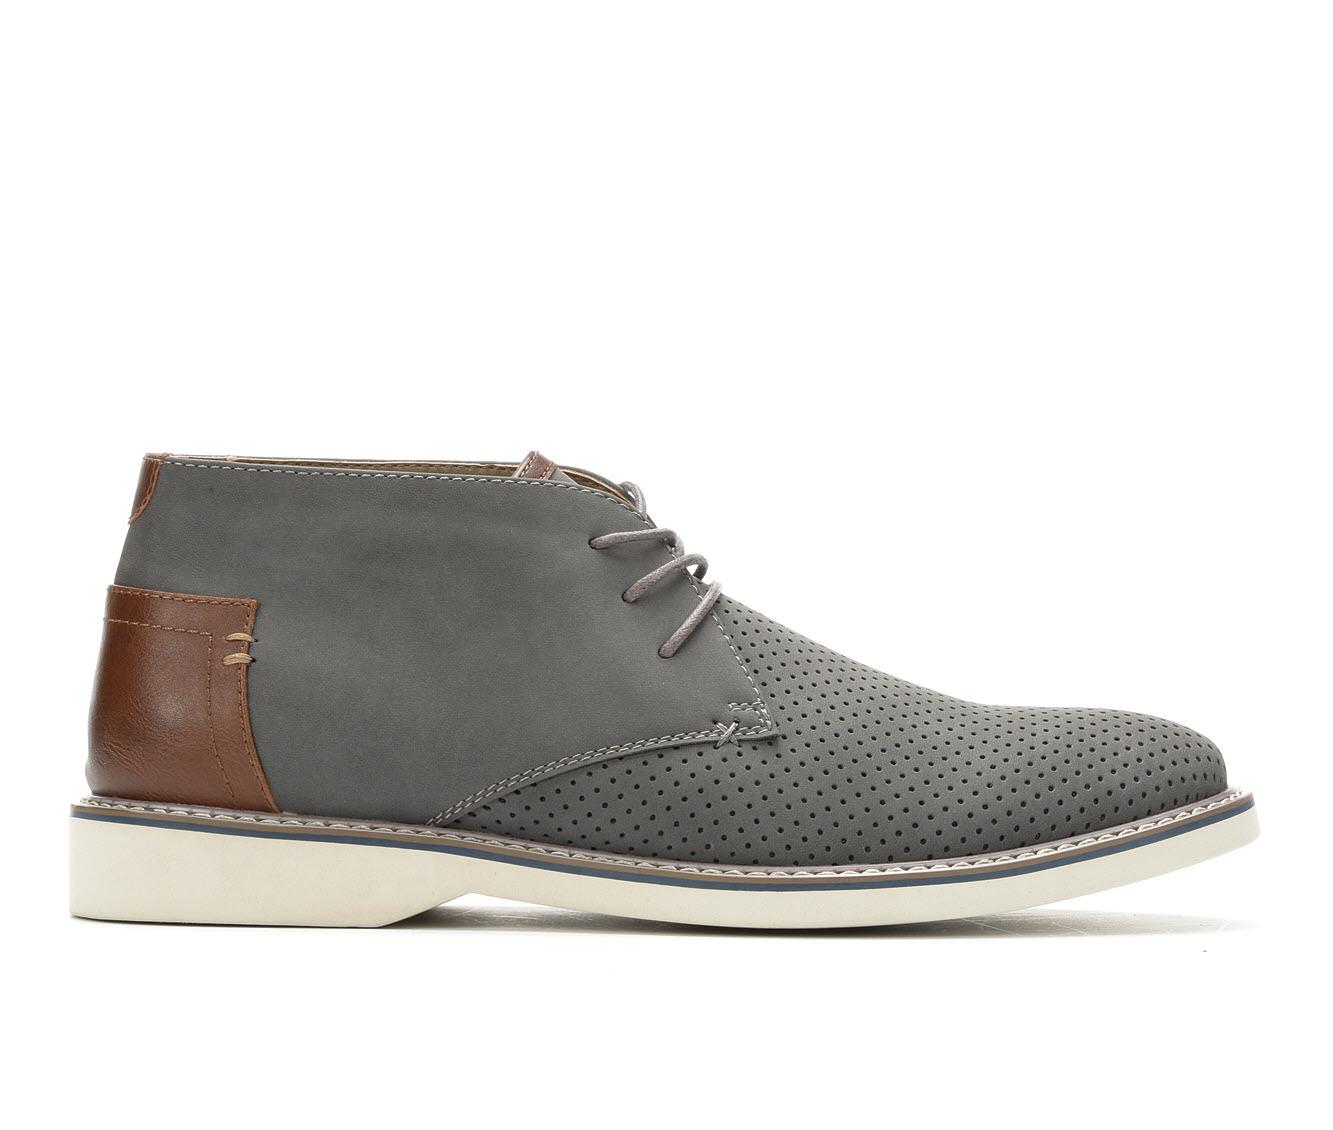 Men's Madden M-Cions Boots (Grey - Size 11.5) 1719415